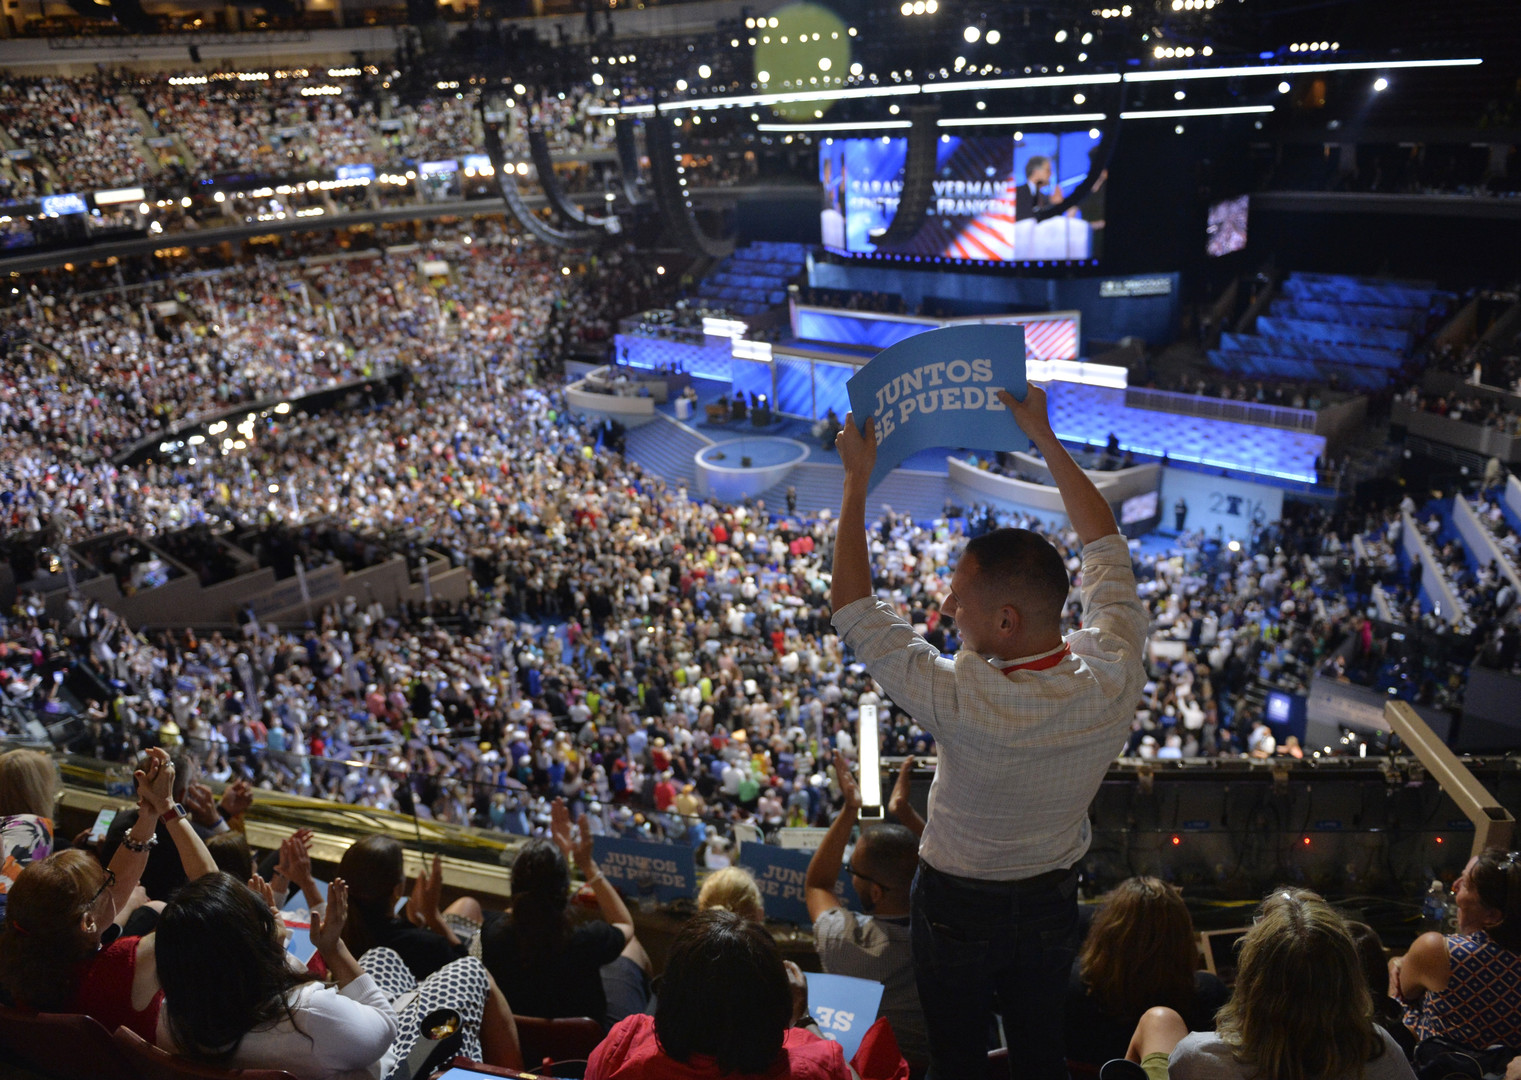 Все любят Хиллари: в США открылся съезд Демократической партии